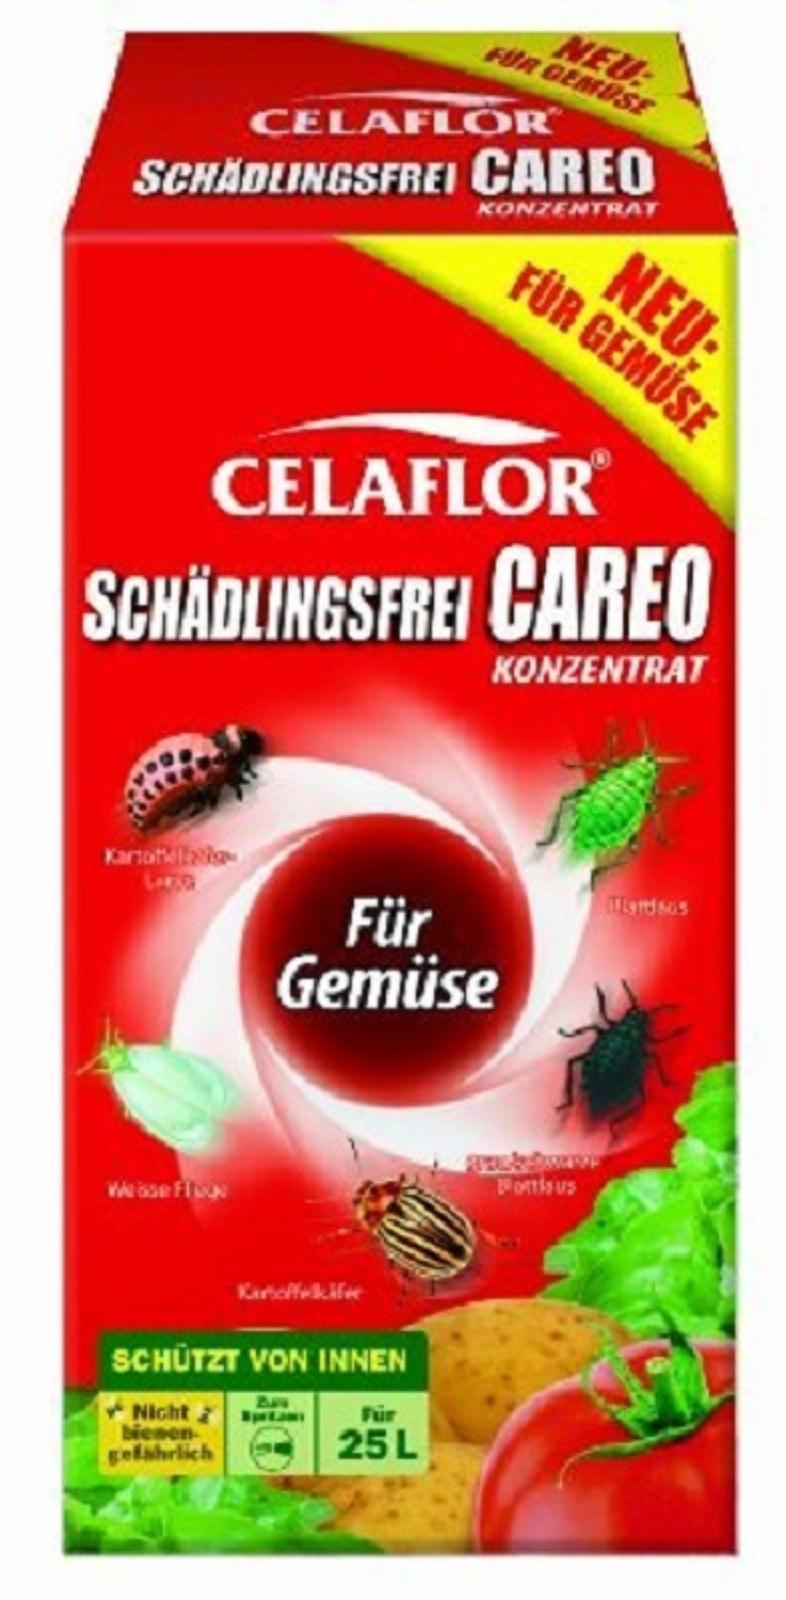 Celaflor Schädlingsfrei Careo Konzentrat Gemüse 250 ml